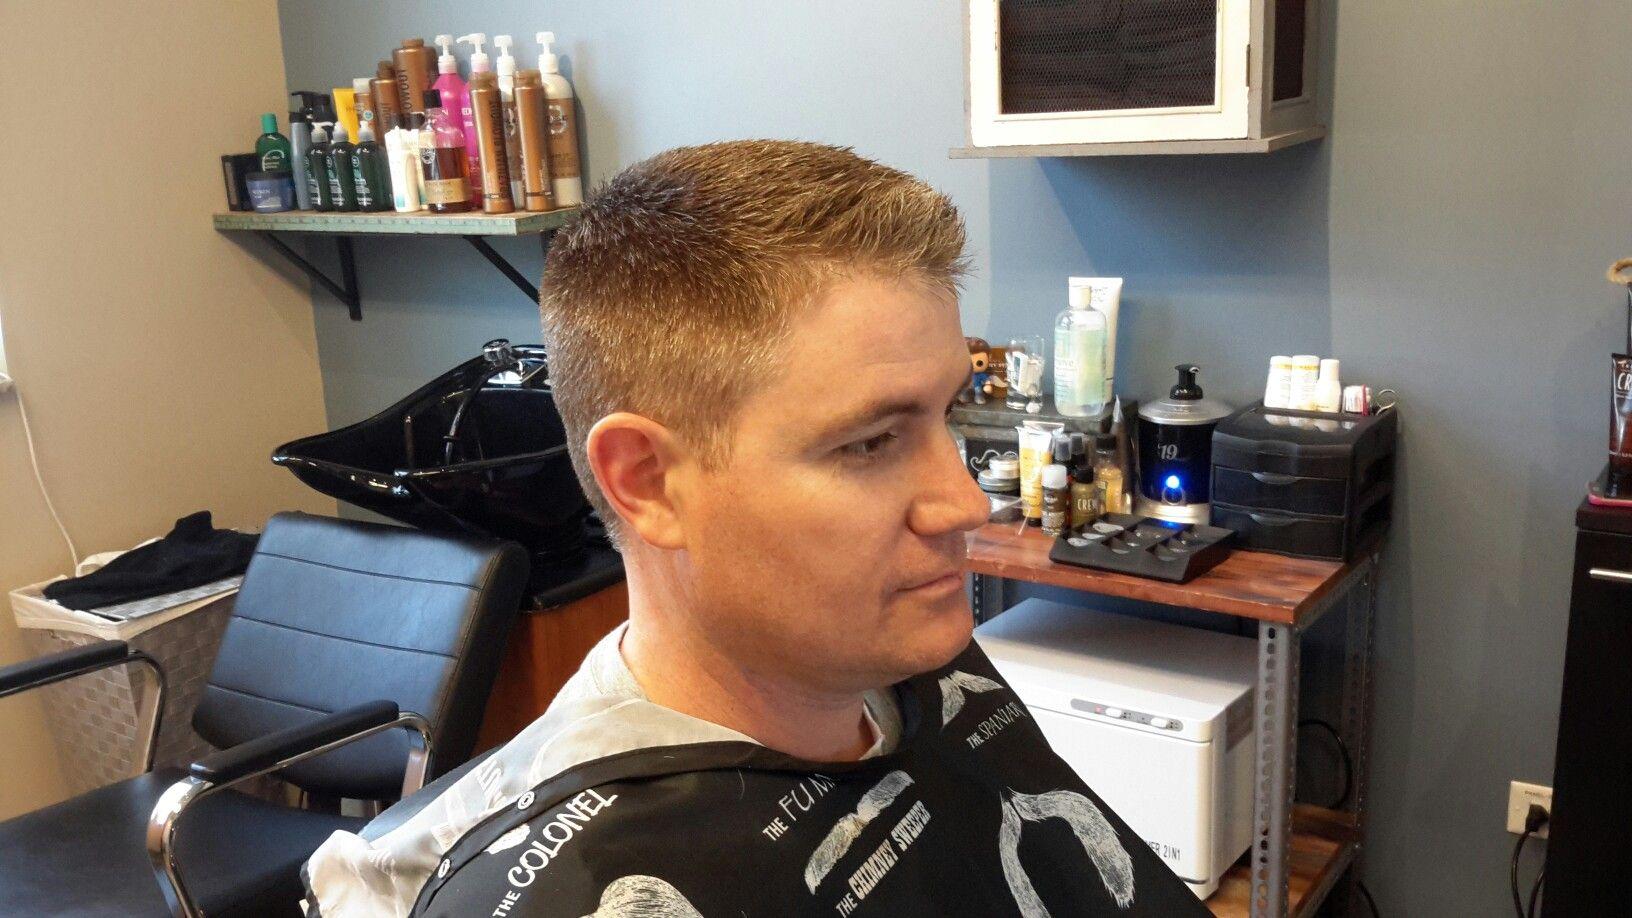 Mens high and tight haircut short haircut shearperfection  menus hairstyles  pinterest